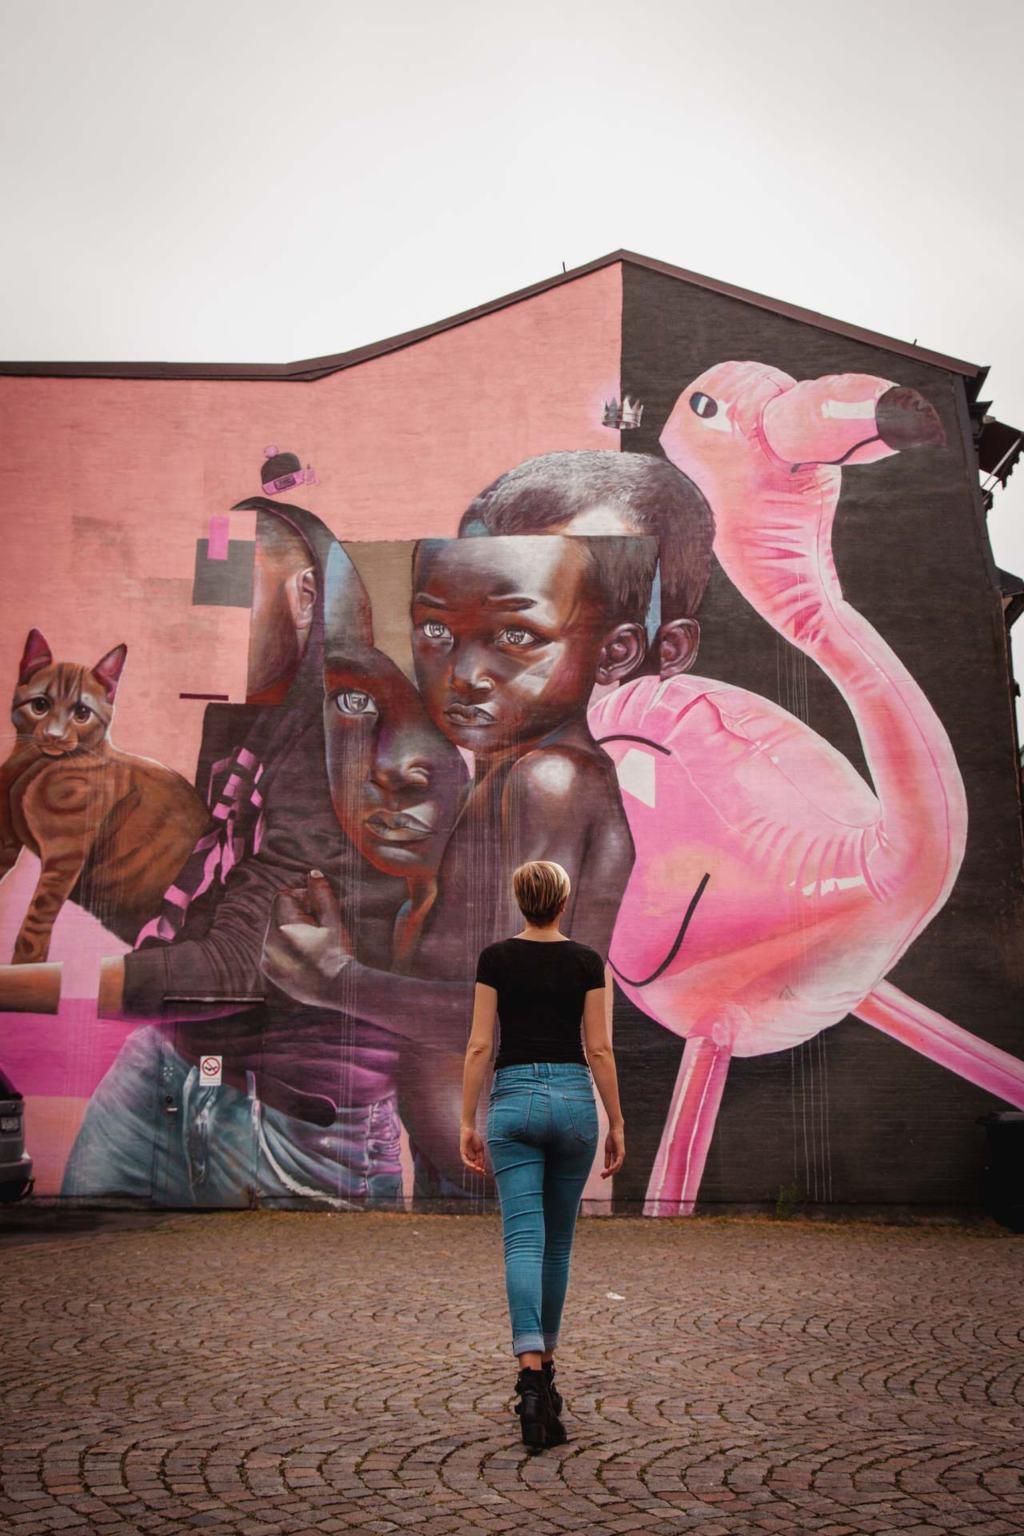 Helsingborg Street Art, In the land of grey and pink, Telmo Miel, Skåne, Sweden